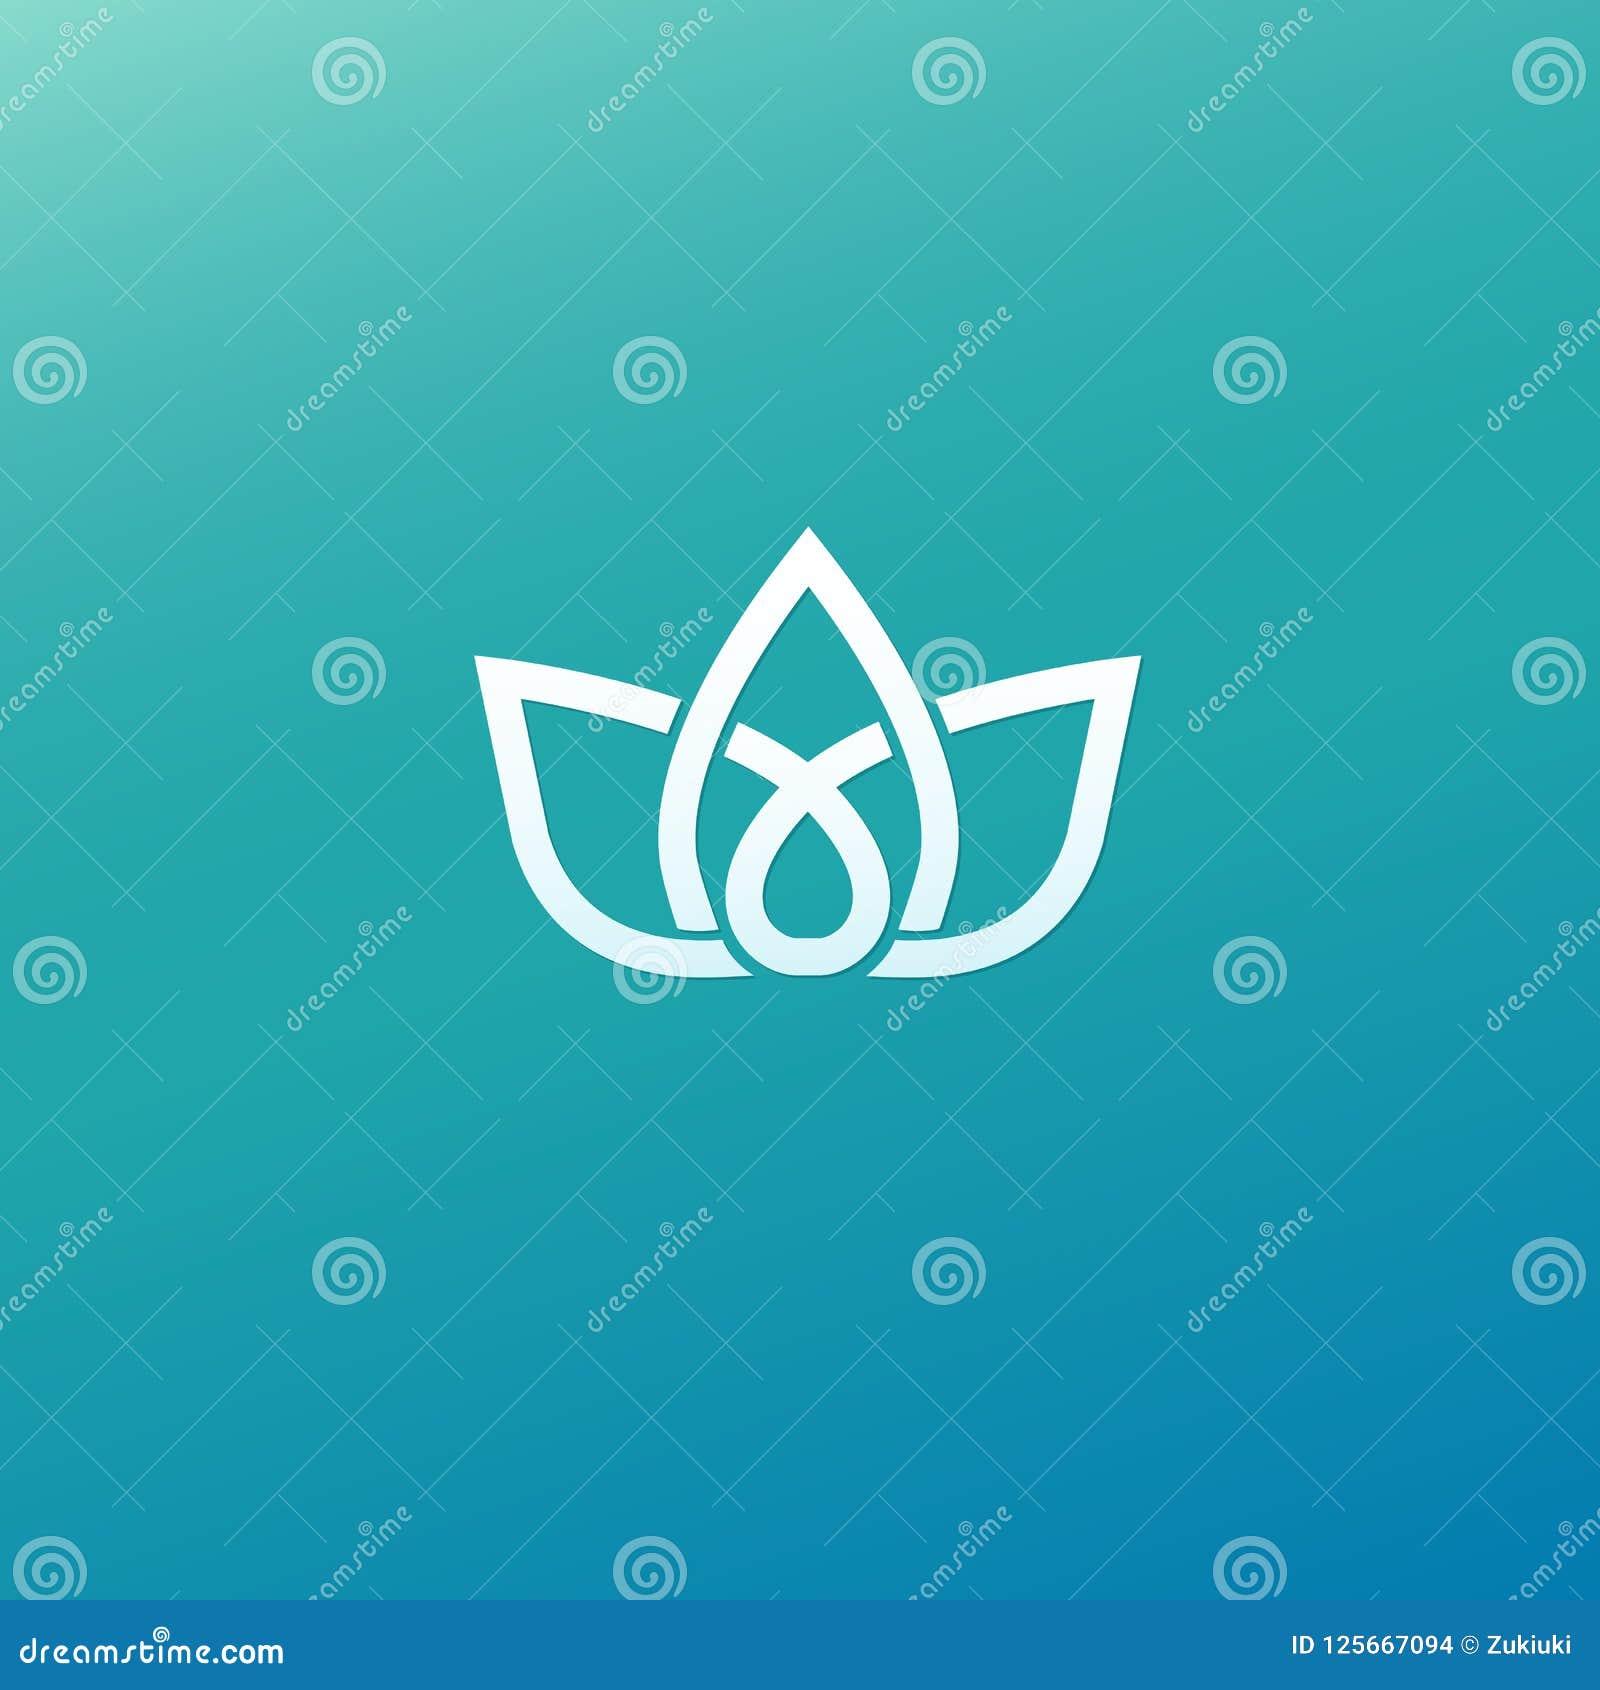 Celtic knot vector. Ornamental tattoo symbol. Luxury circle retro emblem.Traditional scottish vector logo. Simple Line Art Ornate